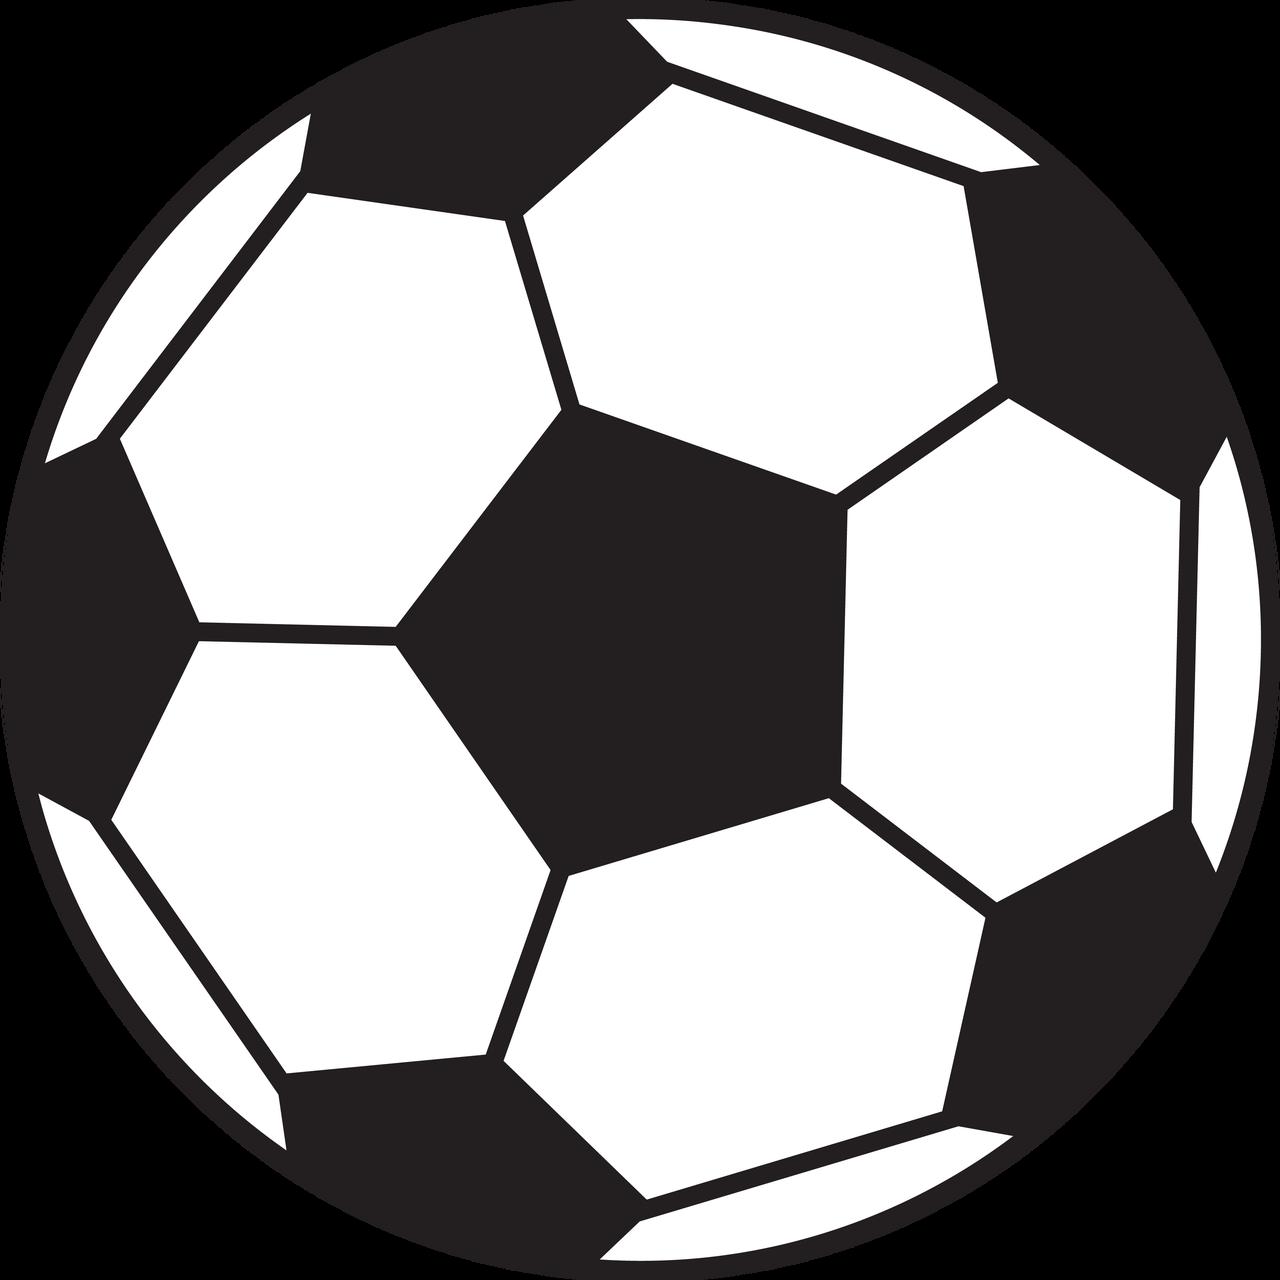 Soccer Ball #2 SVG Cut File - Snap Click Supply Co.